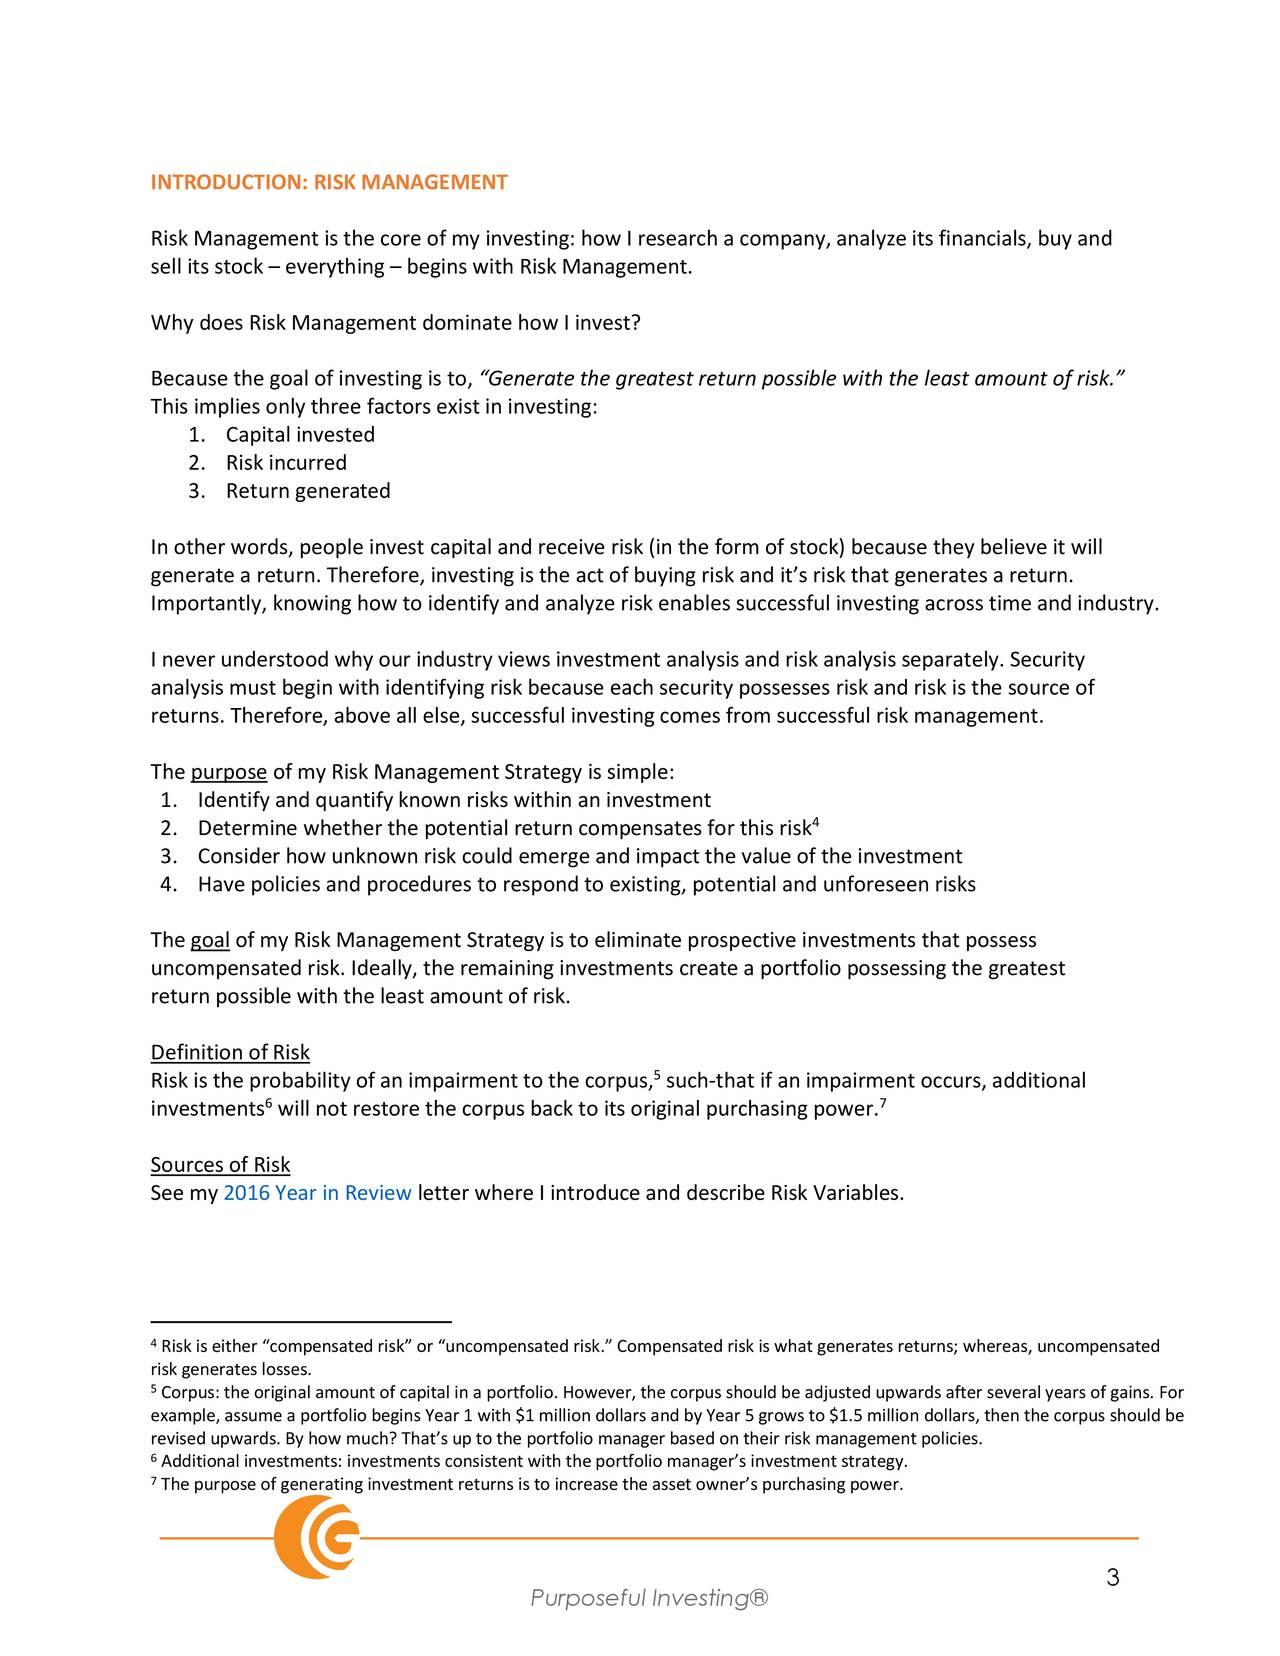 frankenstein vs paradise lost essay Frankenstein vs paradise lost essay ncad essay cover sheet short essay on respect your elders swimming college essay promoting positive health behaviors essay essays.